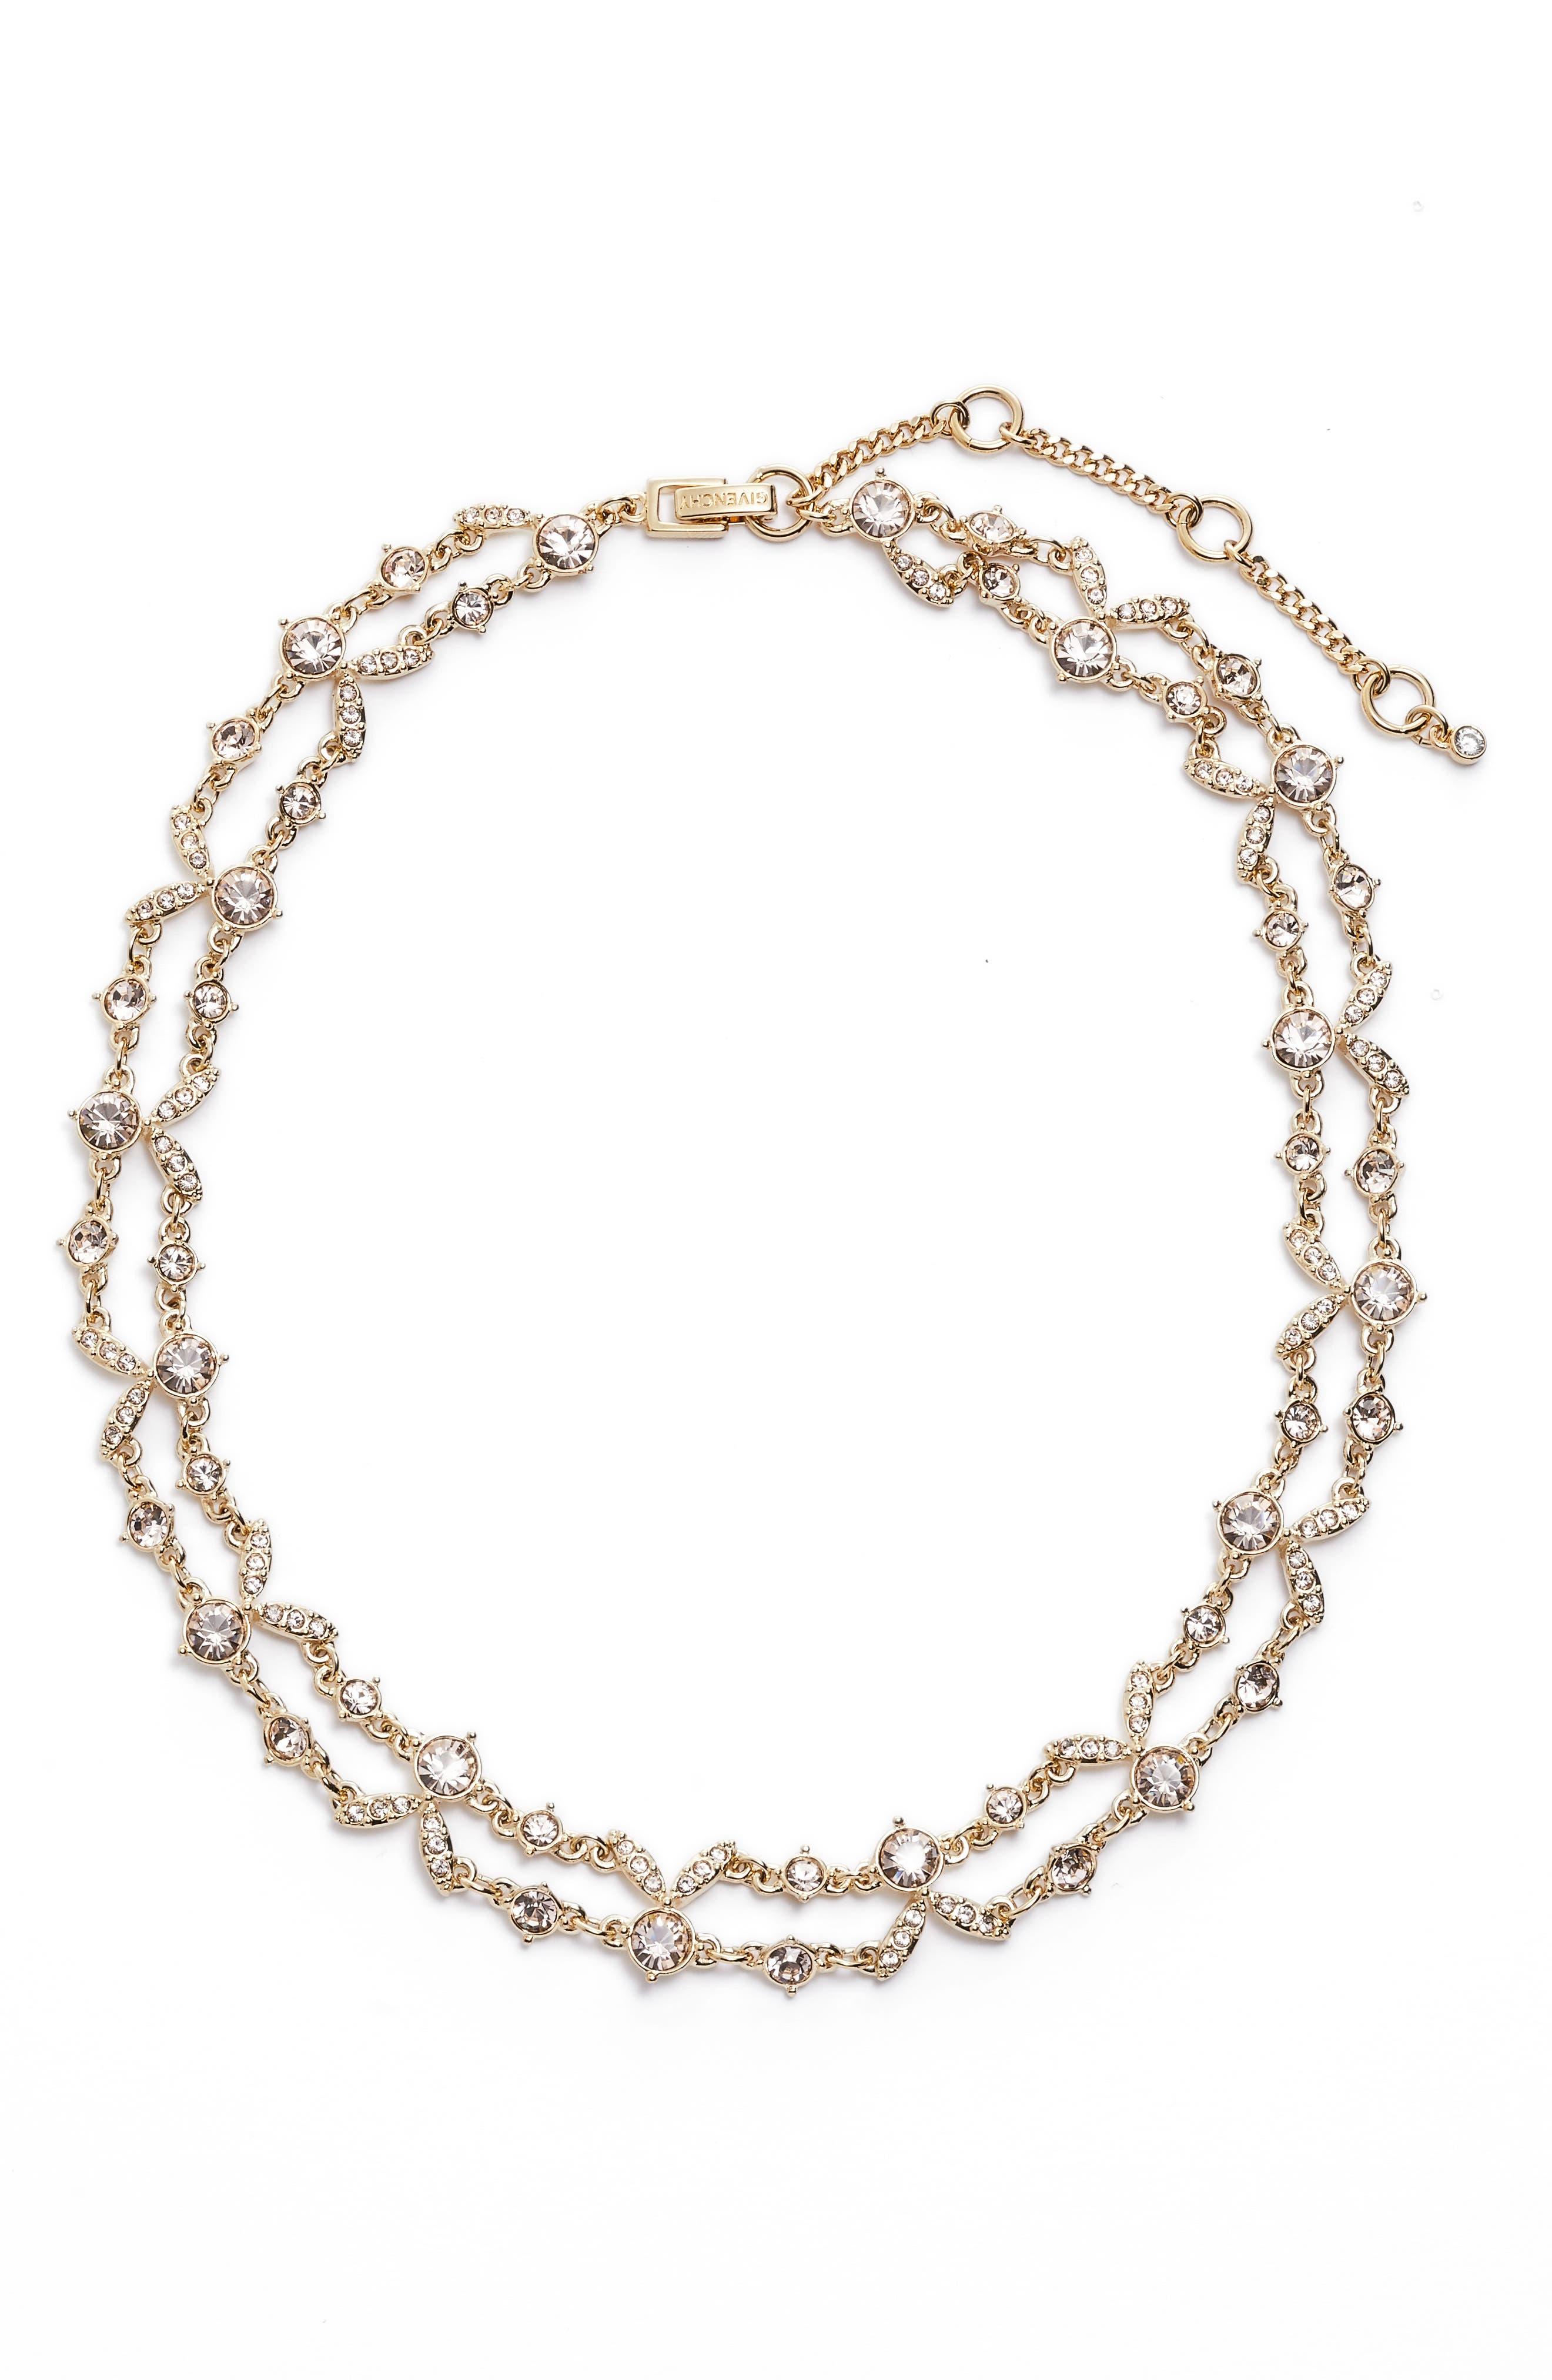 2-Row Crystal Collar Necklace,                         Main,                         color, Gold/ Silk